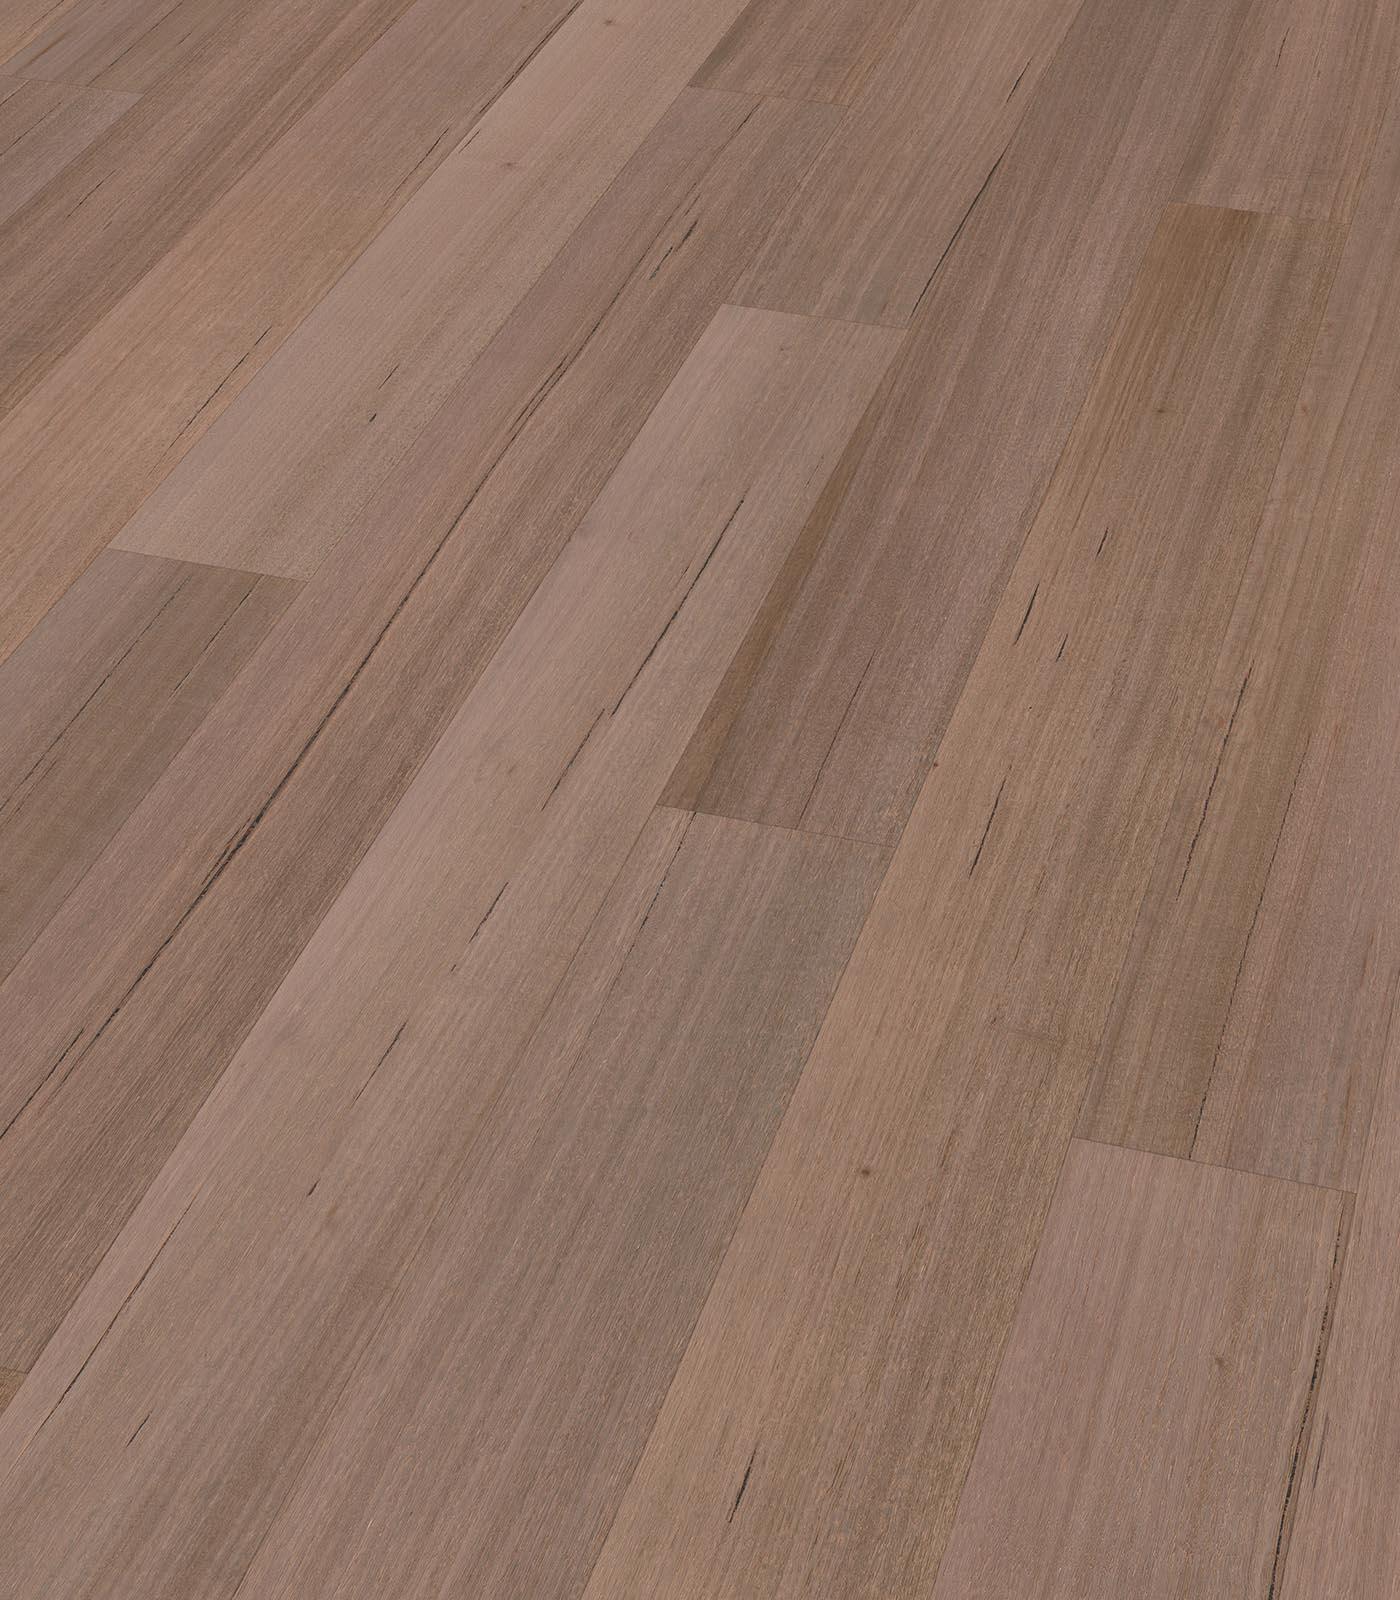 Busselton-Tasmanian Oak Floors-After Oak Collection-angle